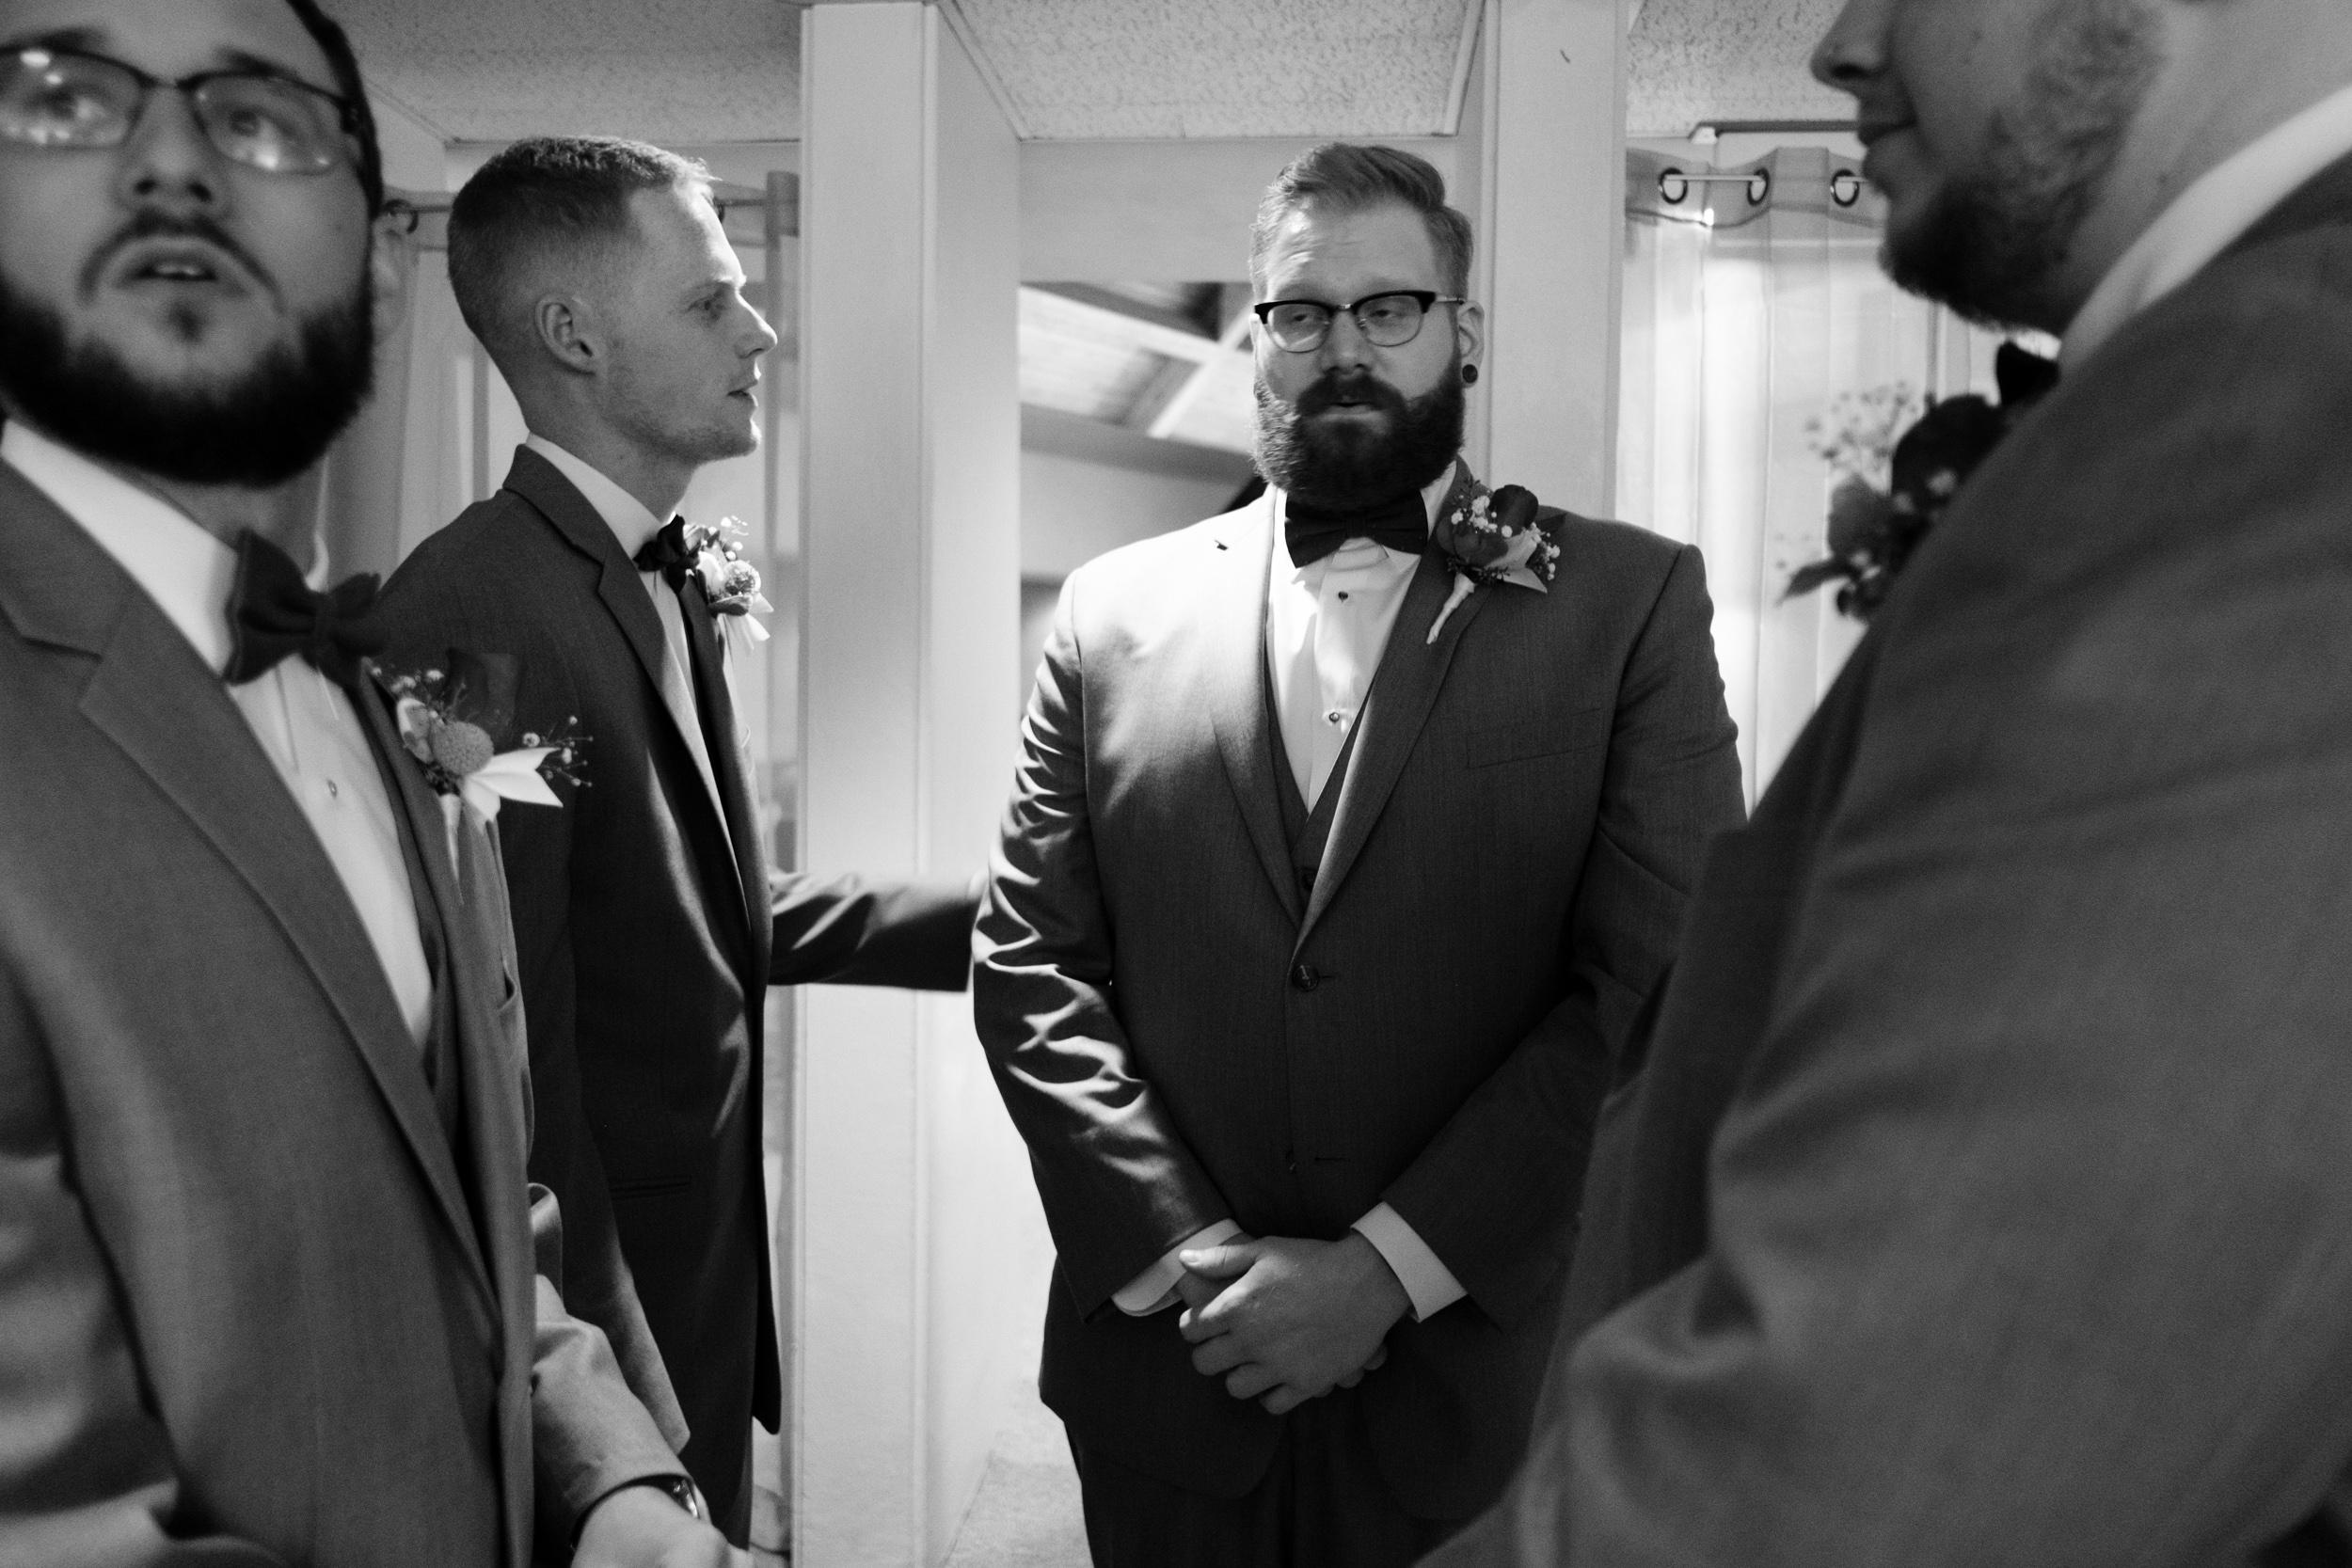 Christian & Sarah wedding photography by Brian milo-139.jpg